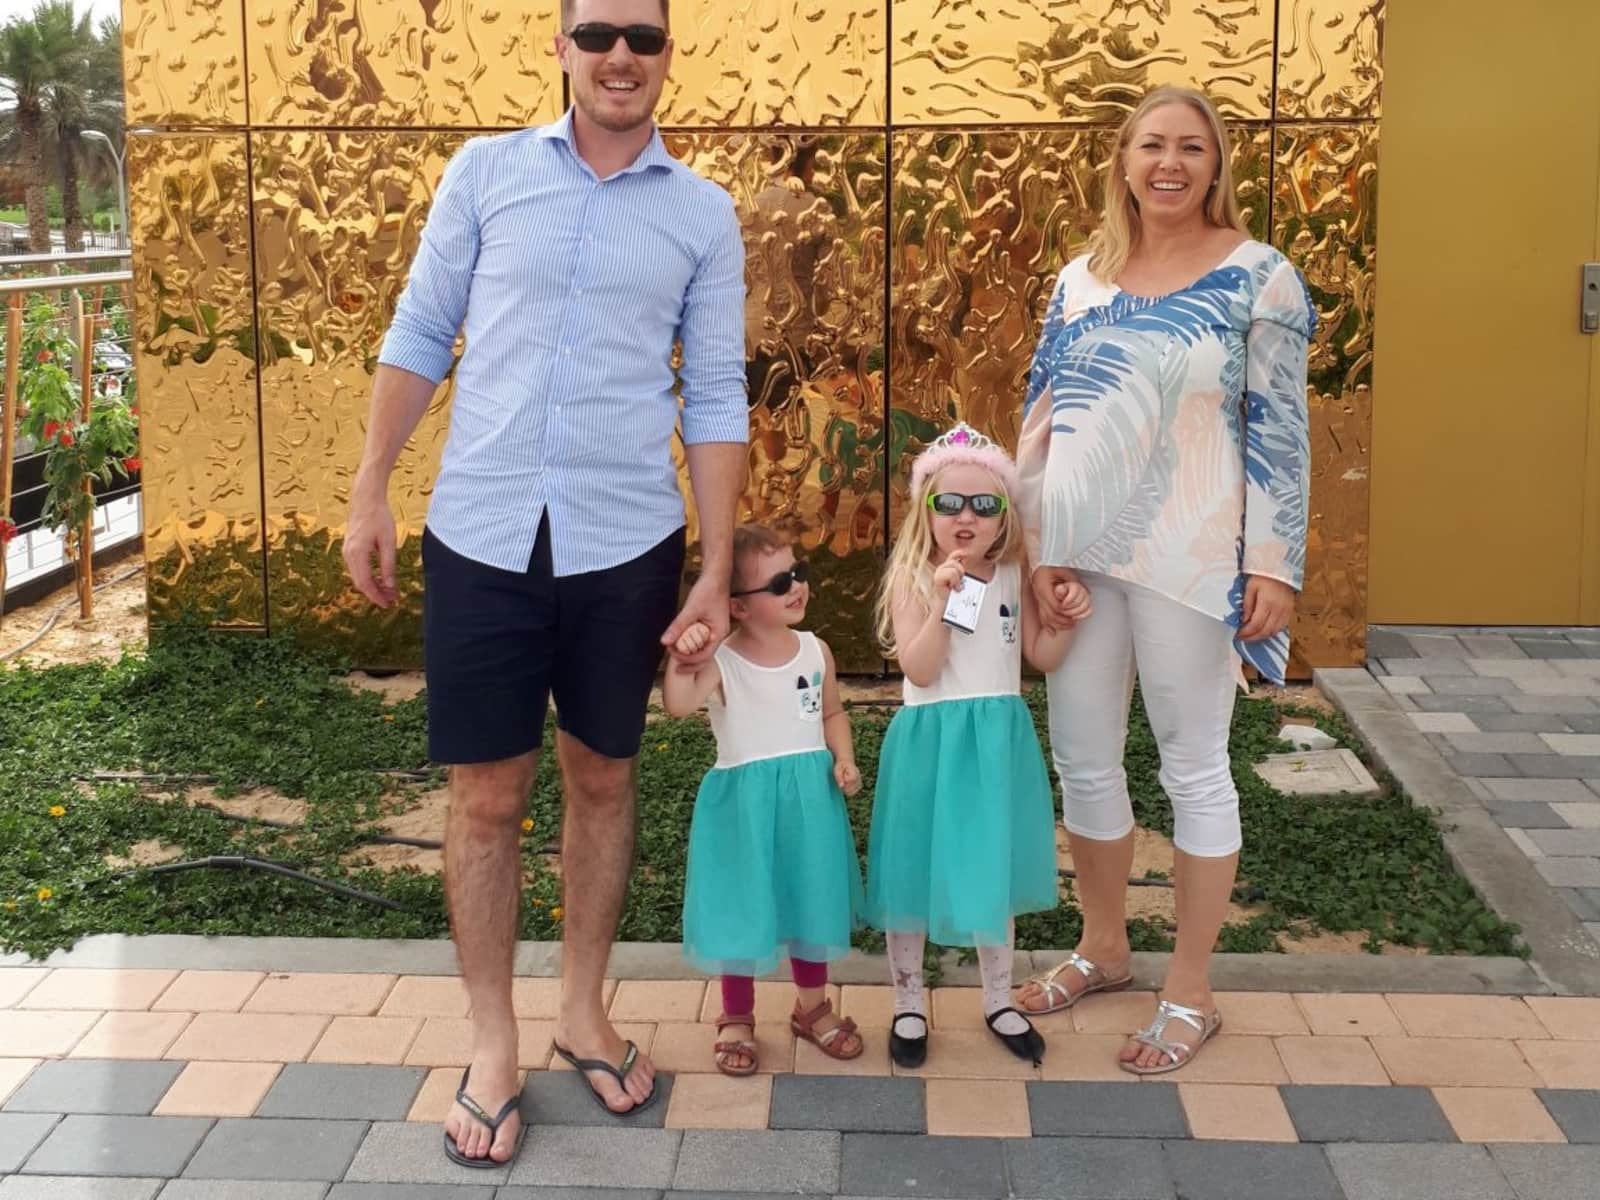 Paul & Camilla from Dubai, United Arab Emirates